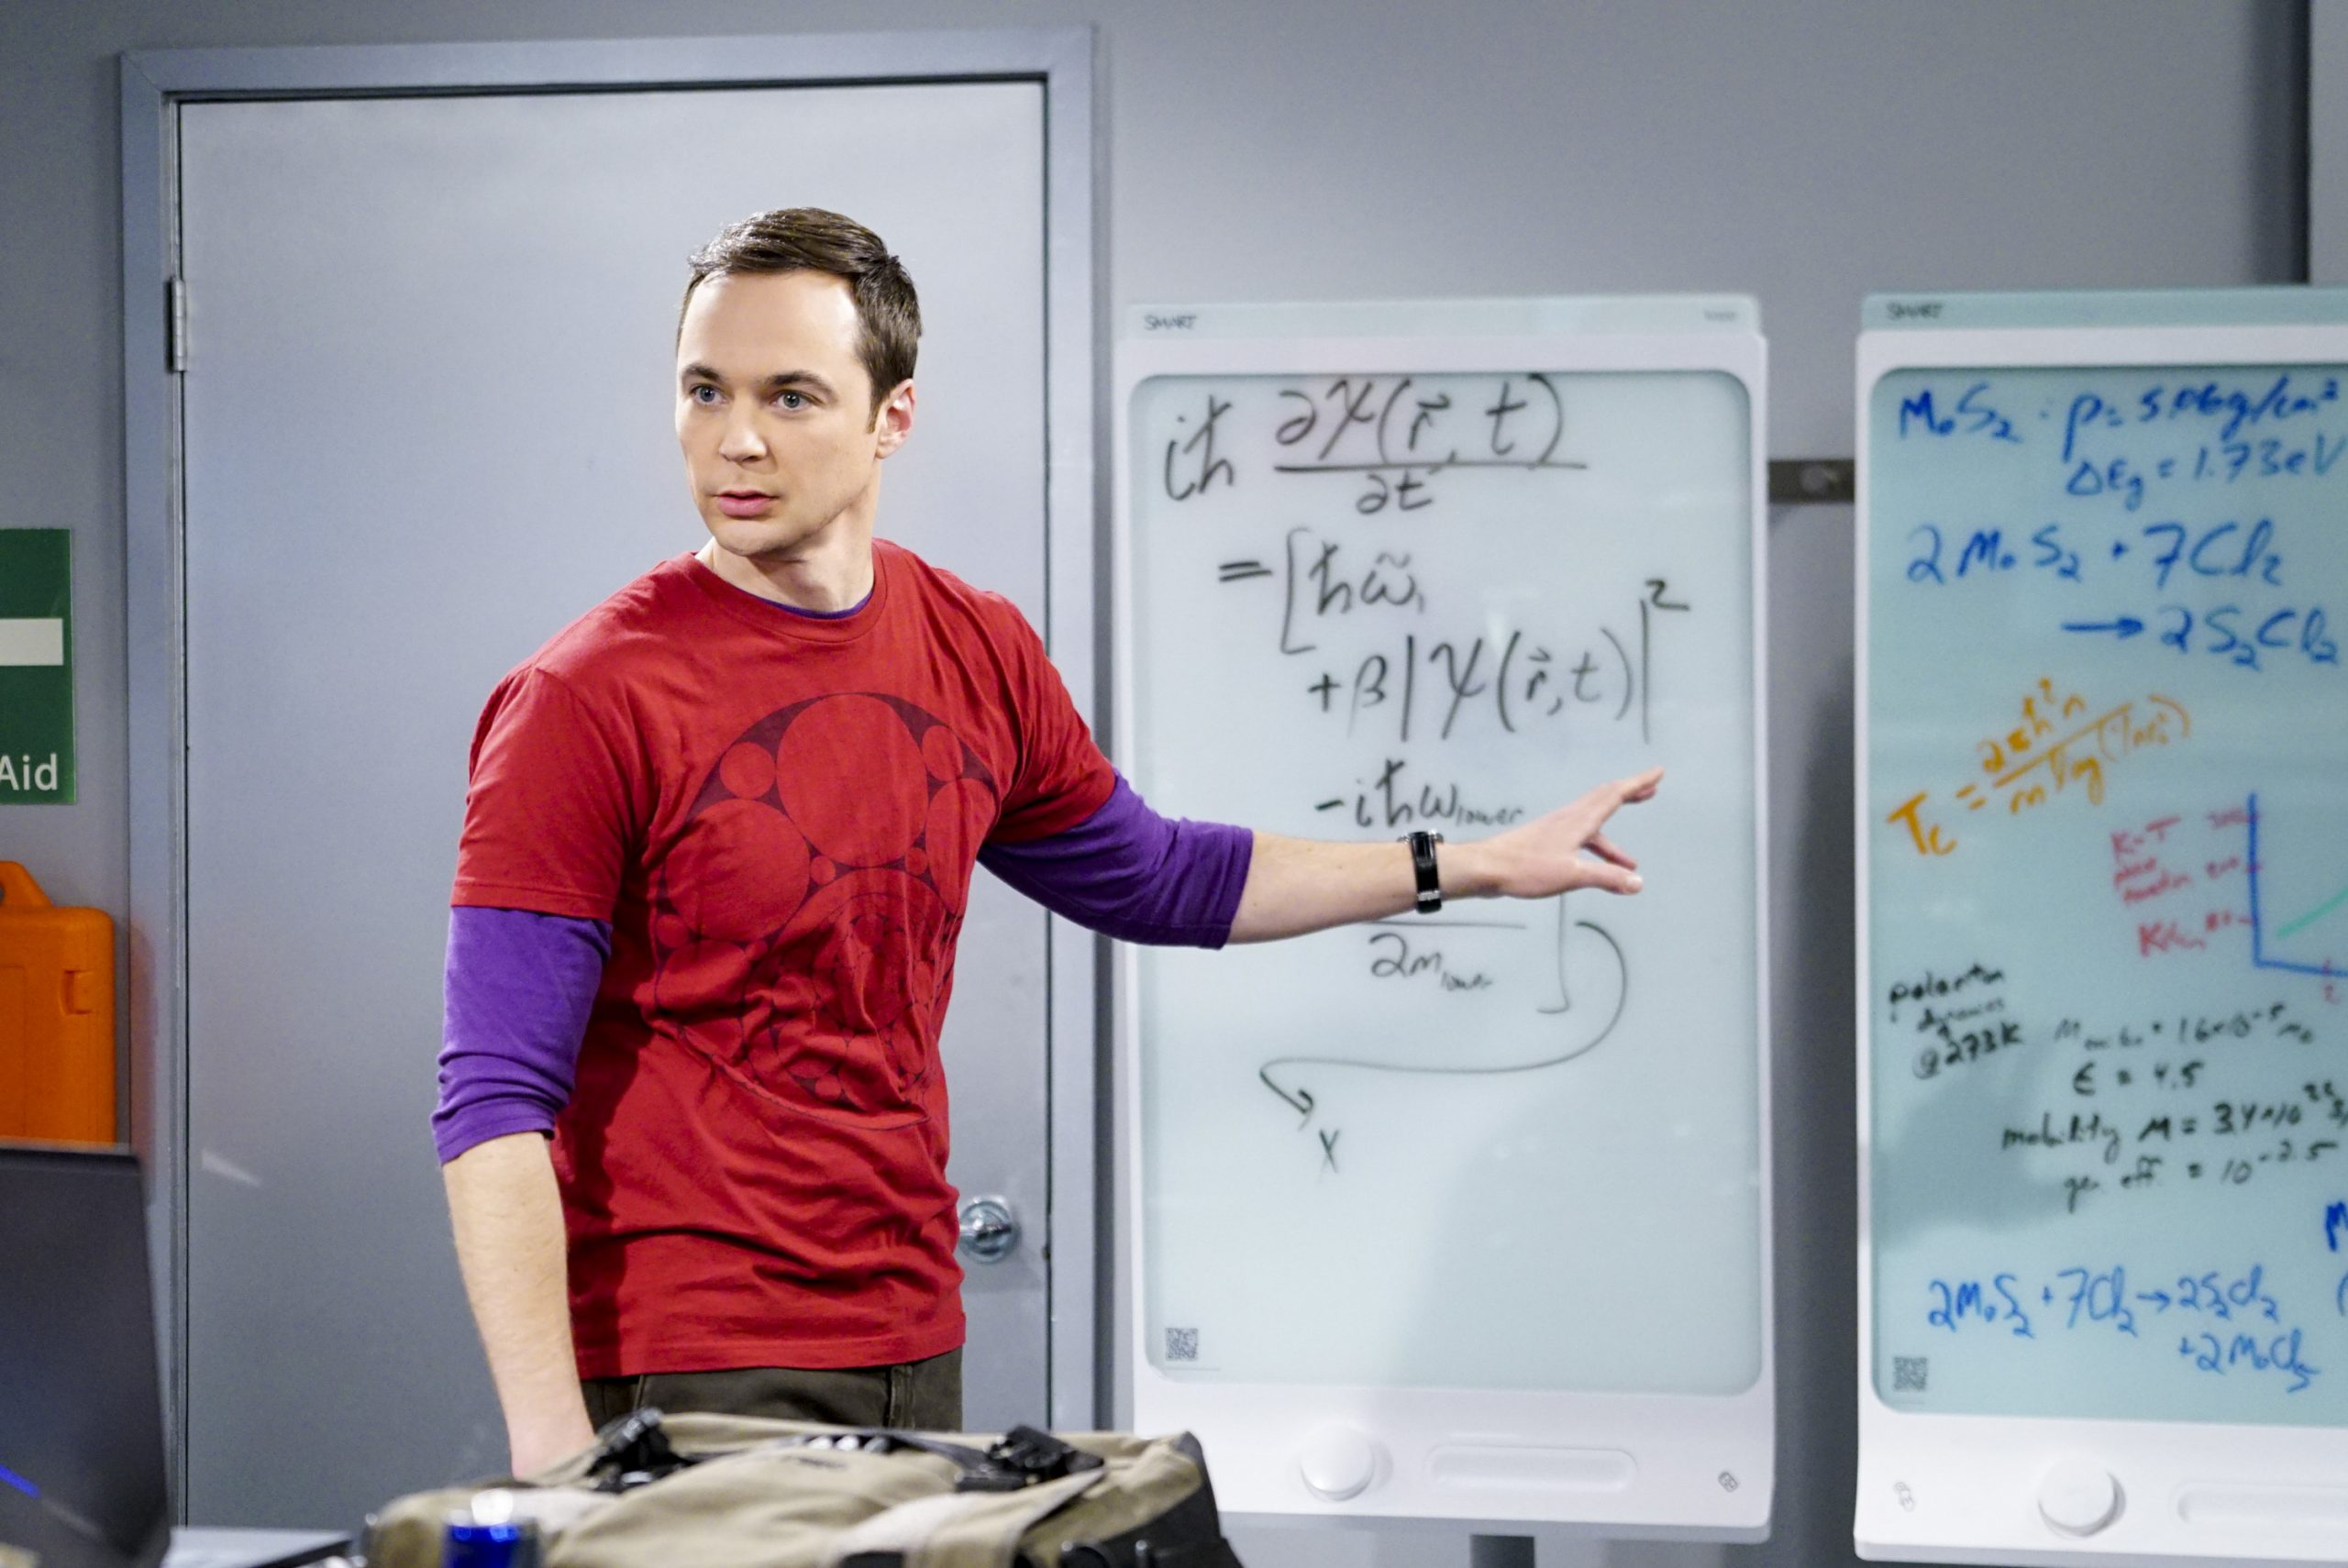 Jim Parsons on The Big Bang Theory